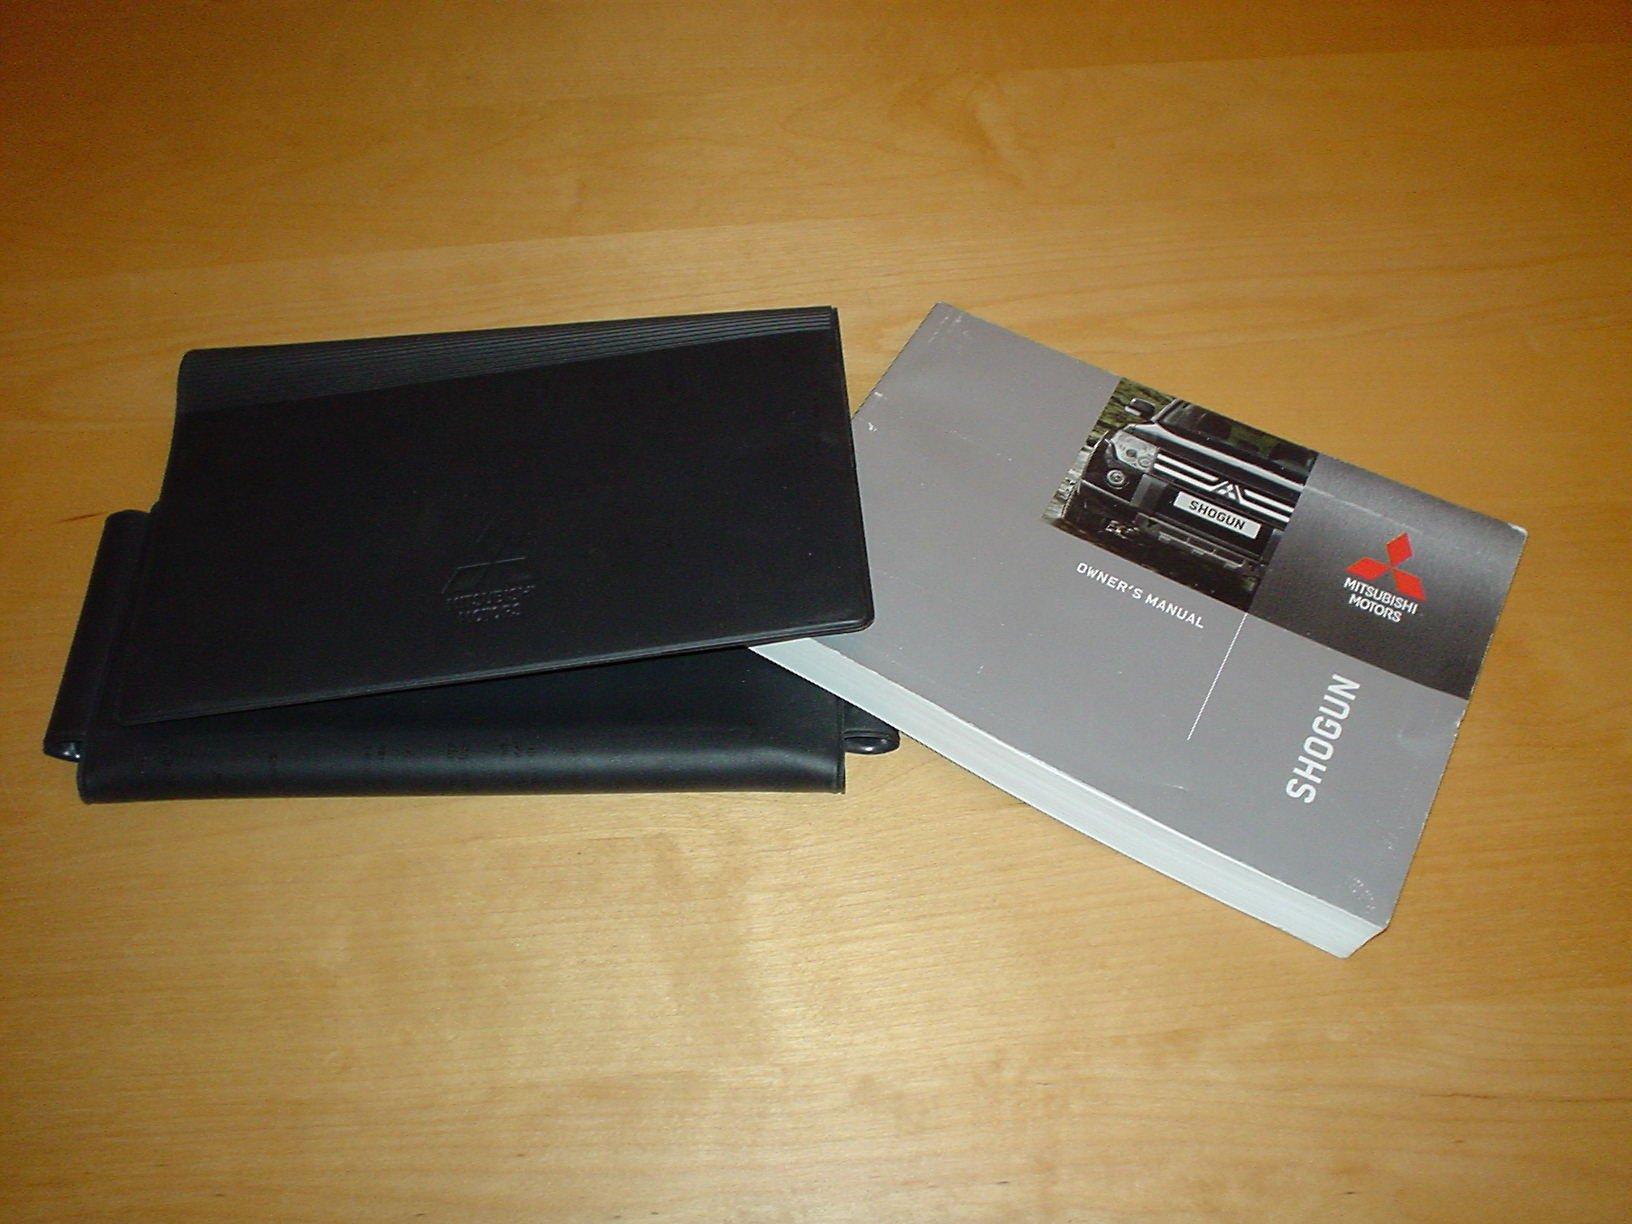 mitsubishi shogun owners manual handbook with wallet 2006 2013 rh amazon co uk Mitsubishi Pajero Shogun user manual mitsubishi pajero